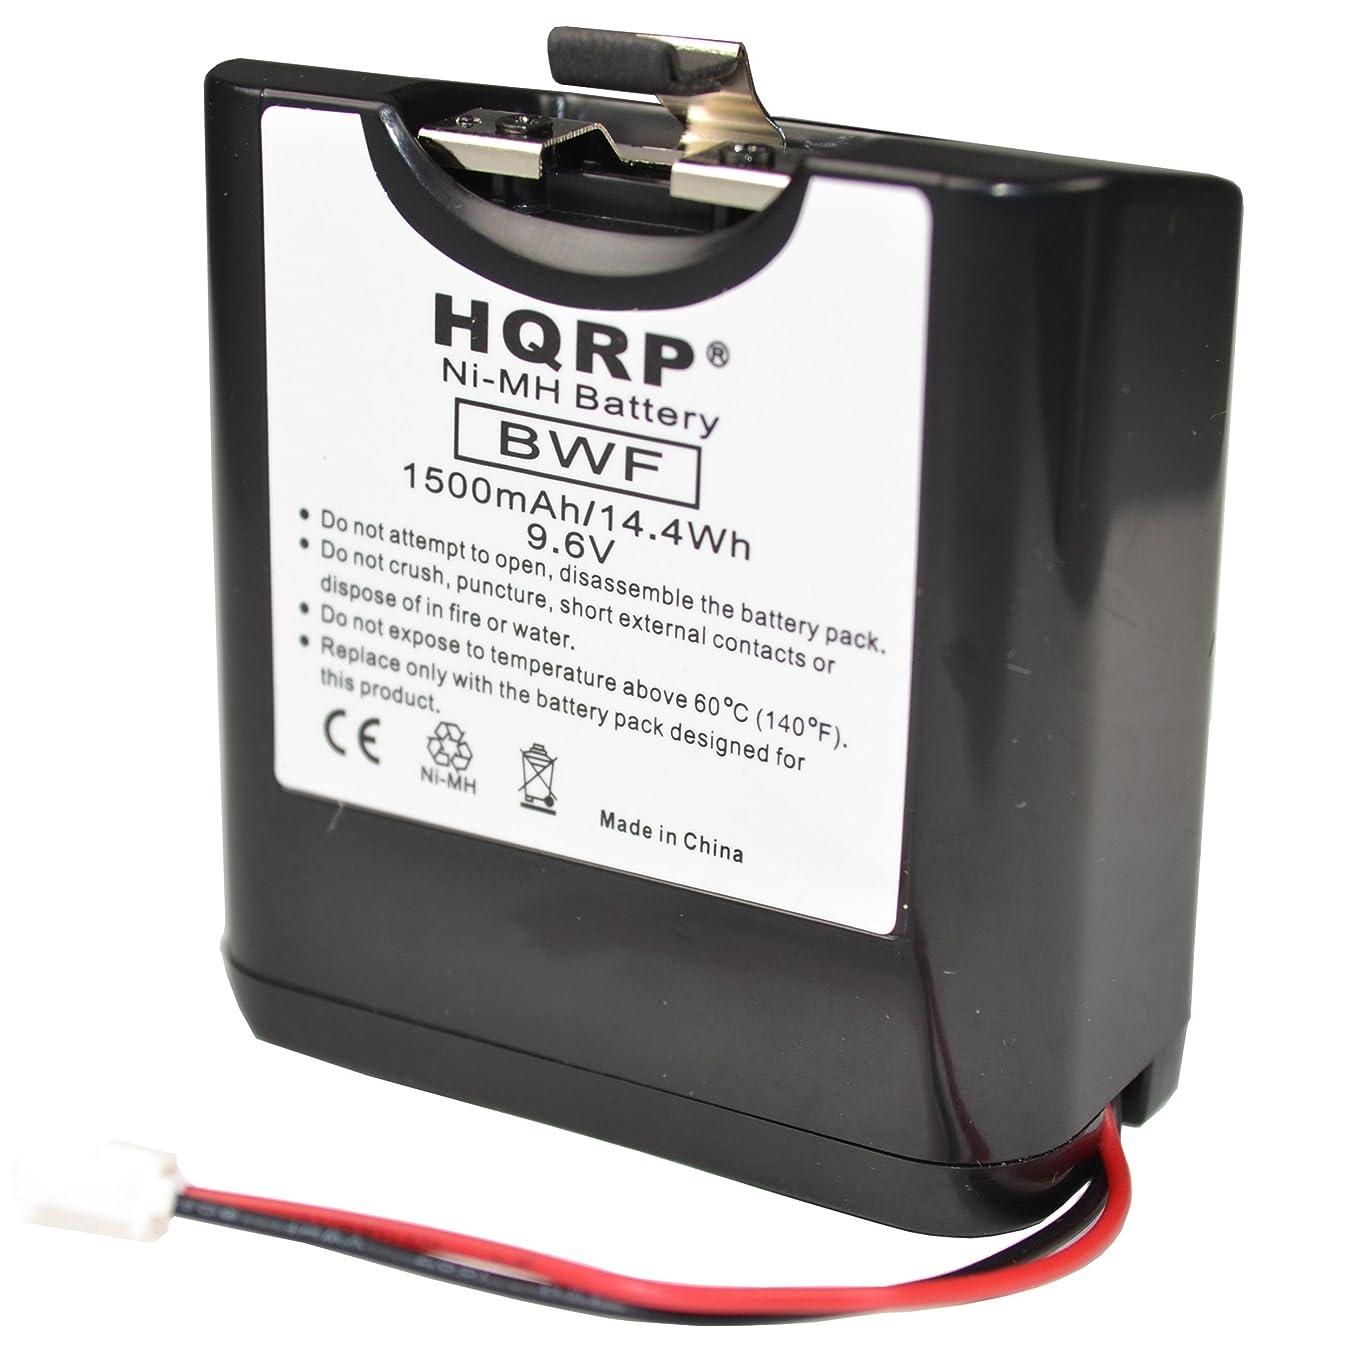 HQRP Battery for SONY NH-2000RDP fits XDR-DS12iP RDP-XF100iP RDP-V20IP Dock Radio, Audio Docking System NH2000RDP NH 2000RDP + HQRP Coaster